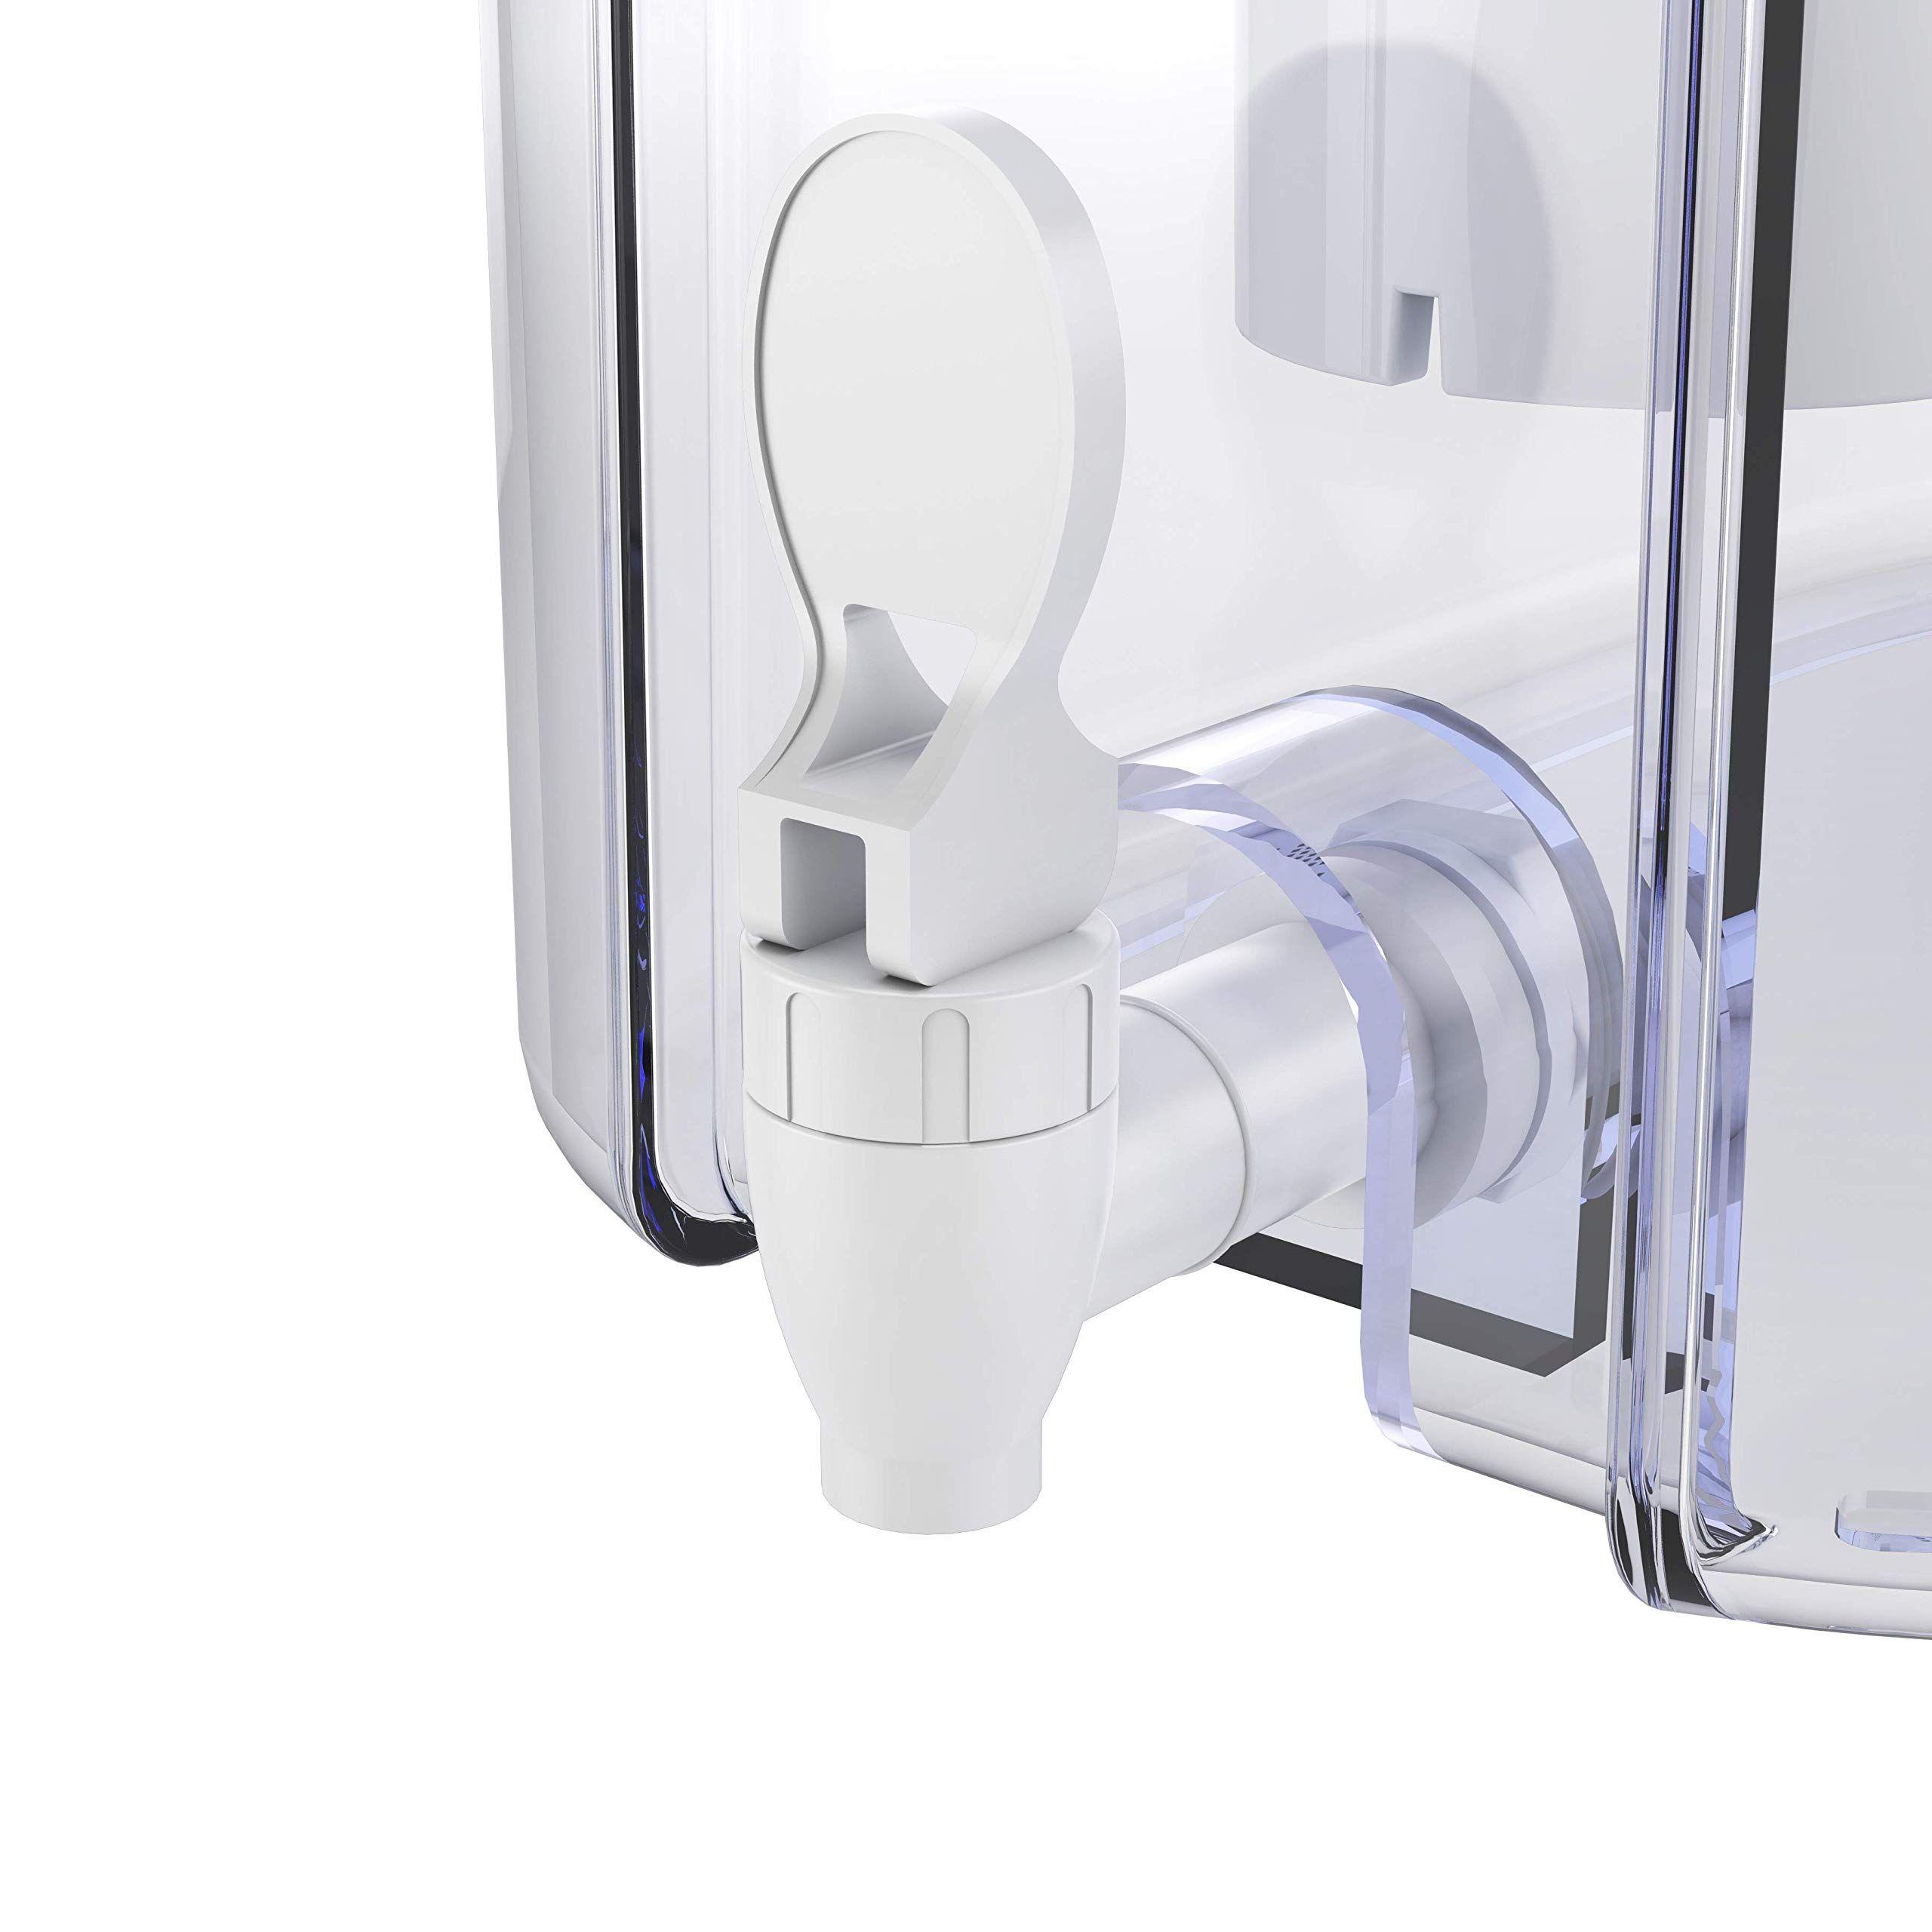 Ph Recharge Alkaline Water Filter A Countertop Water Filter